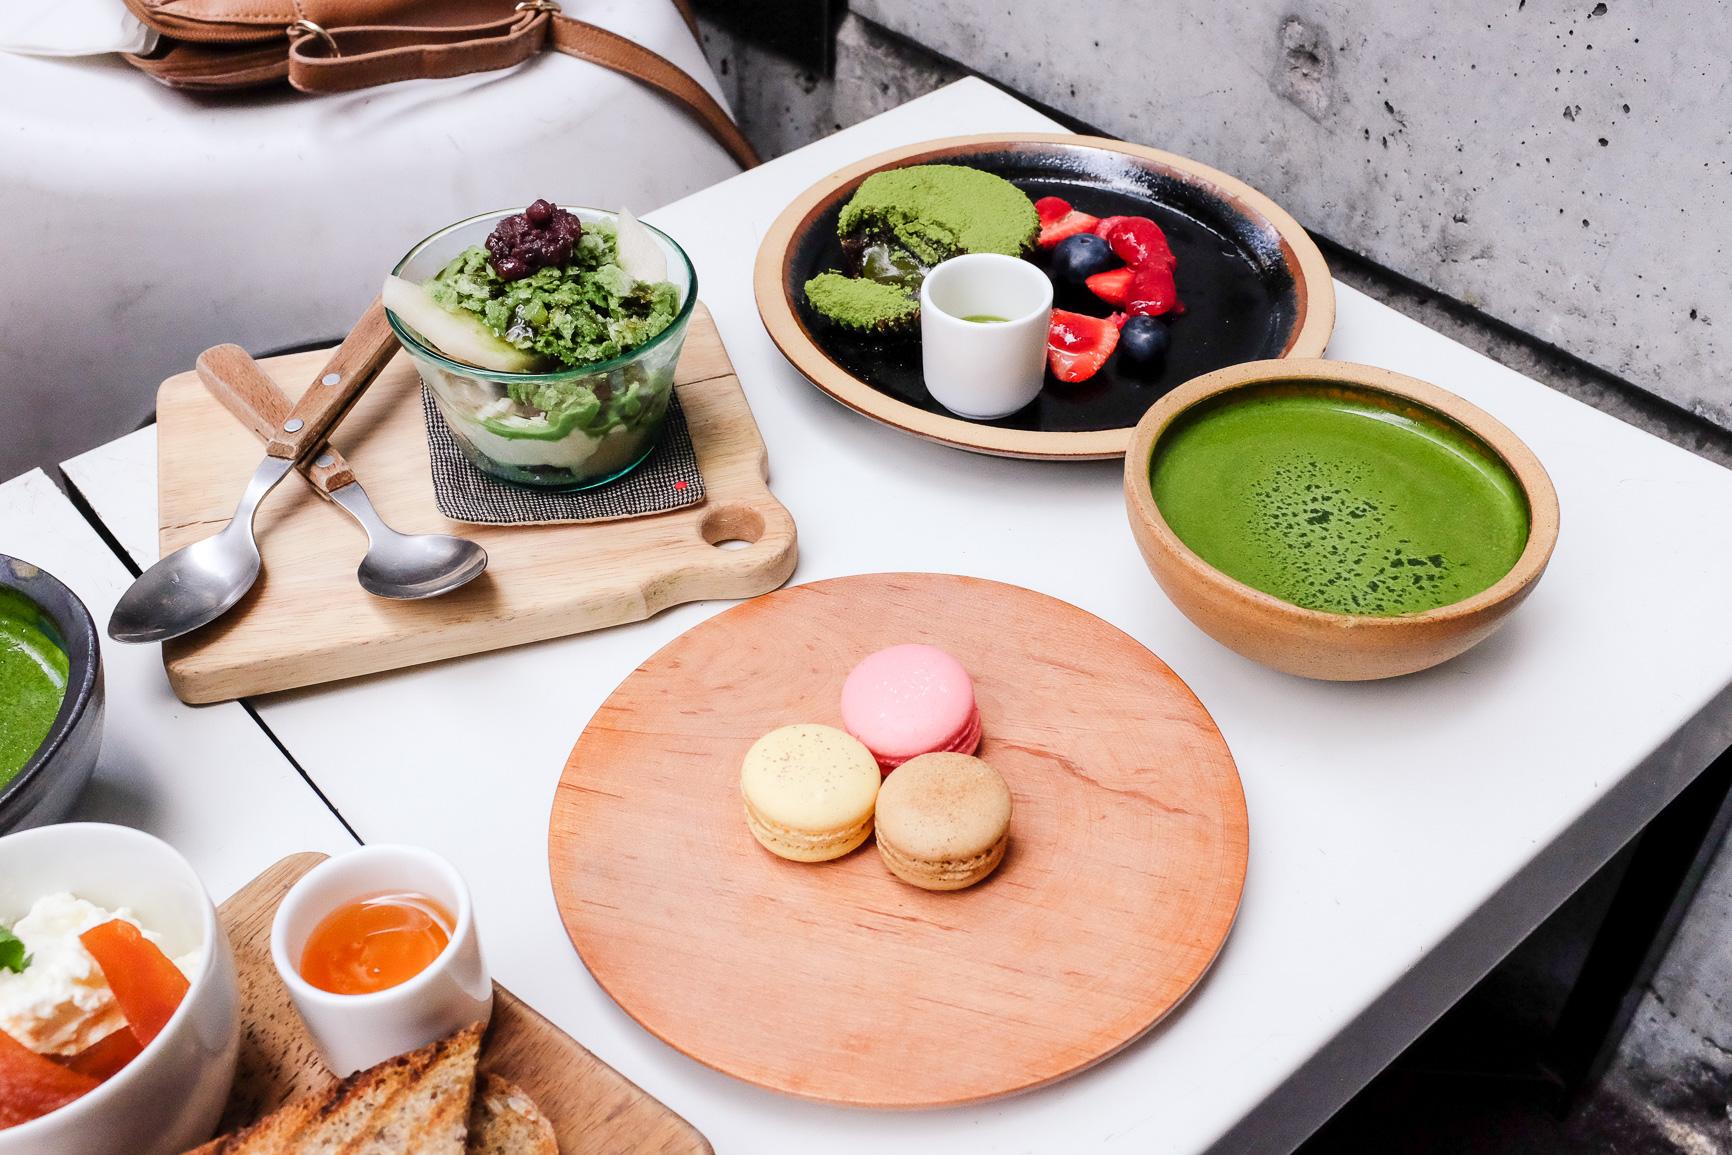 Kinako mochi, roasted green tea jelly, red beans and kuromitsu syrup ($9.50) and chai latte, yuzu and lemonade, lychee and raspberry macarons ($3.00ea)